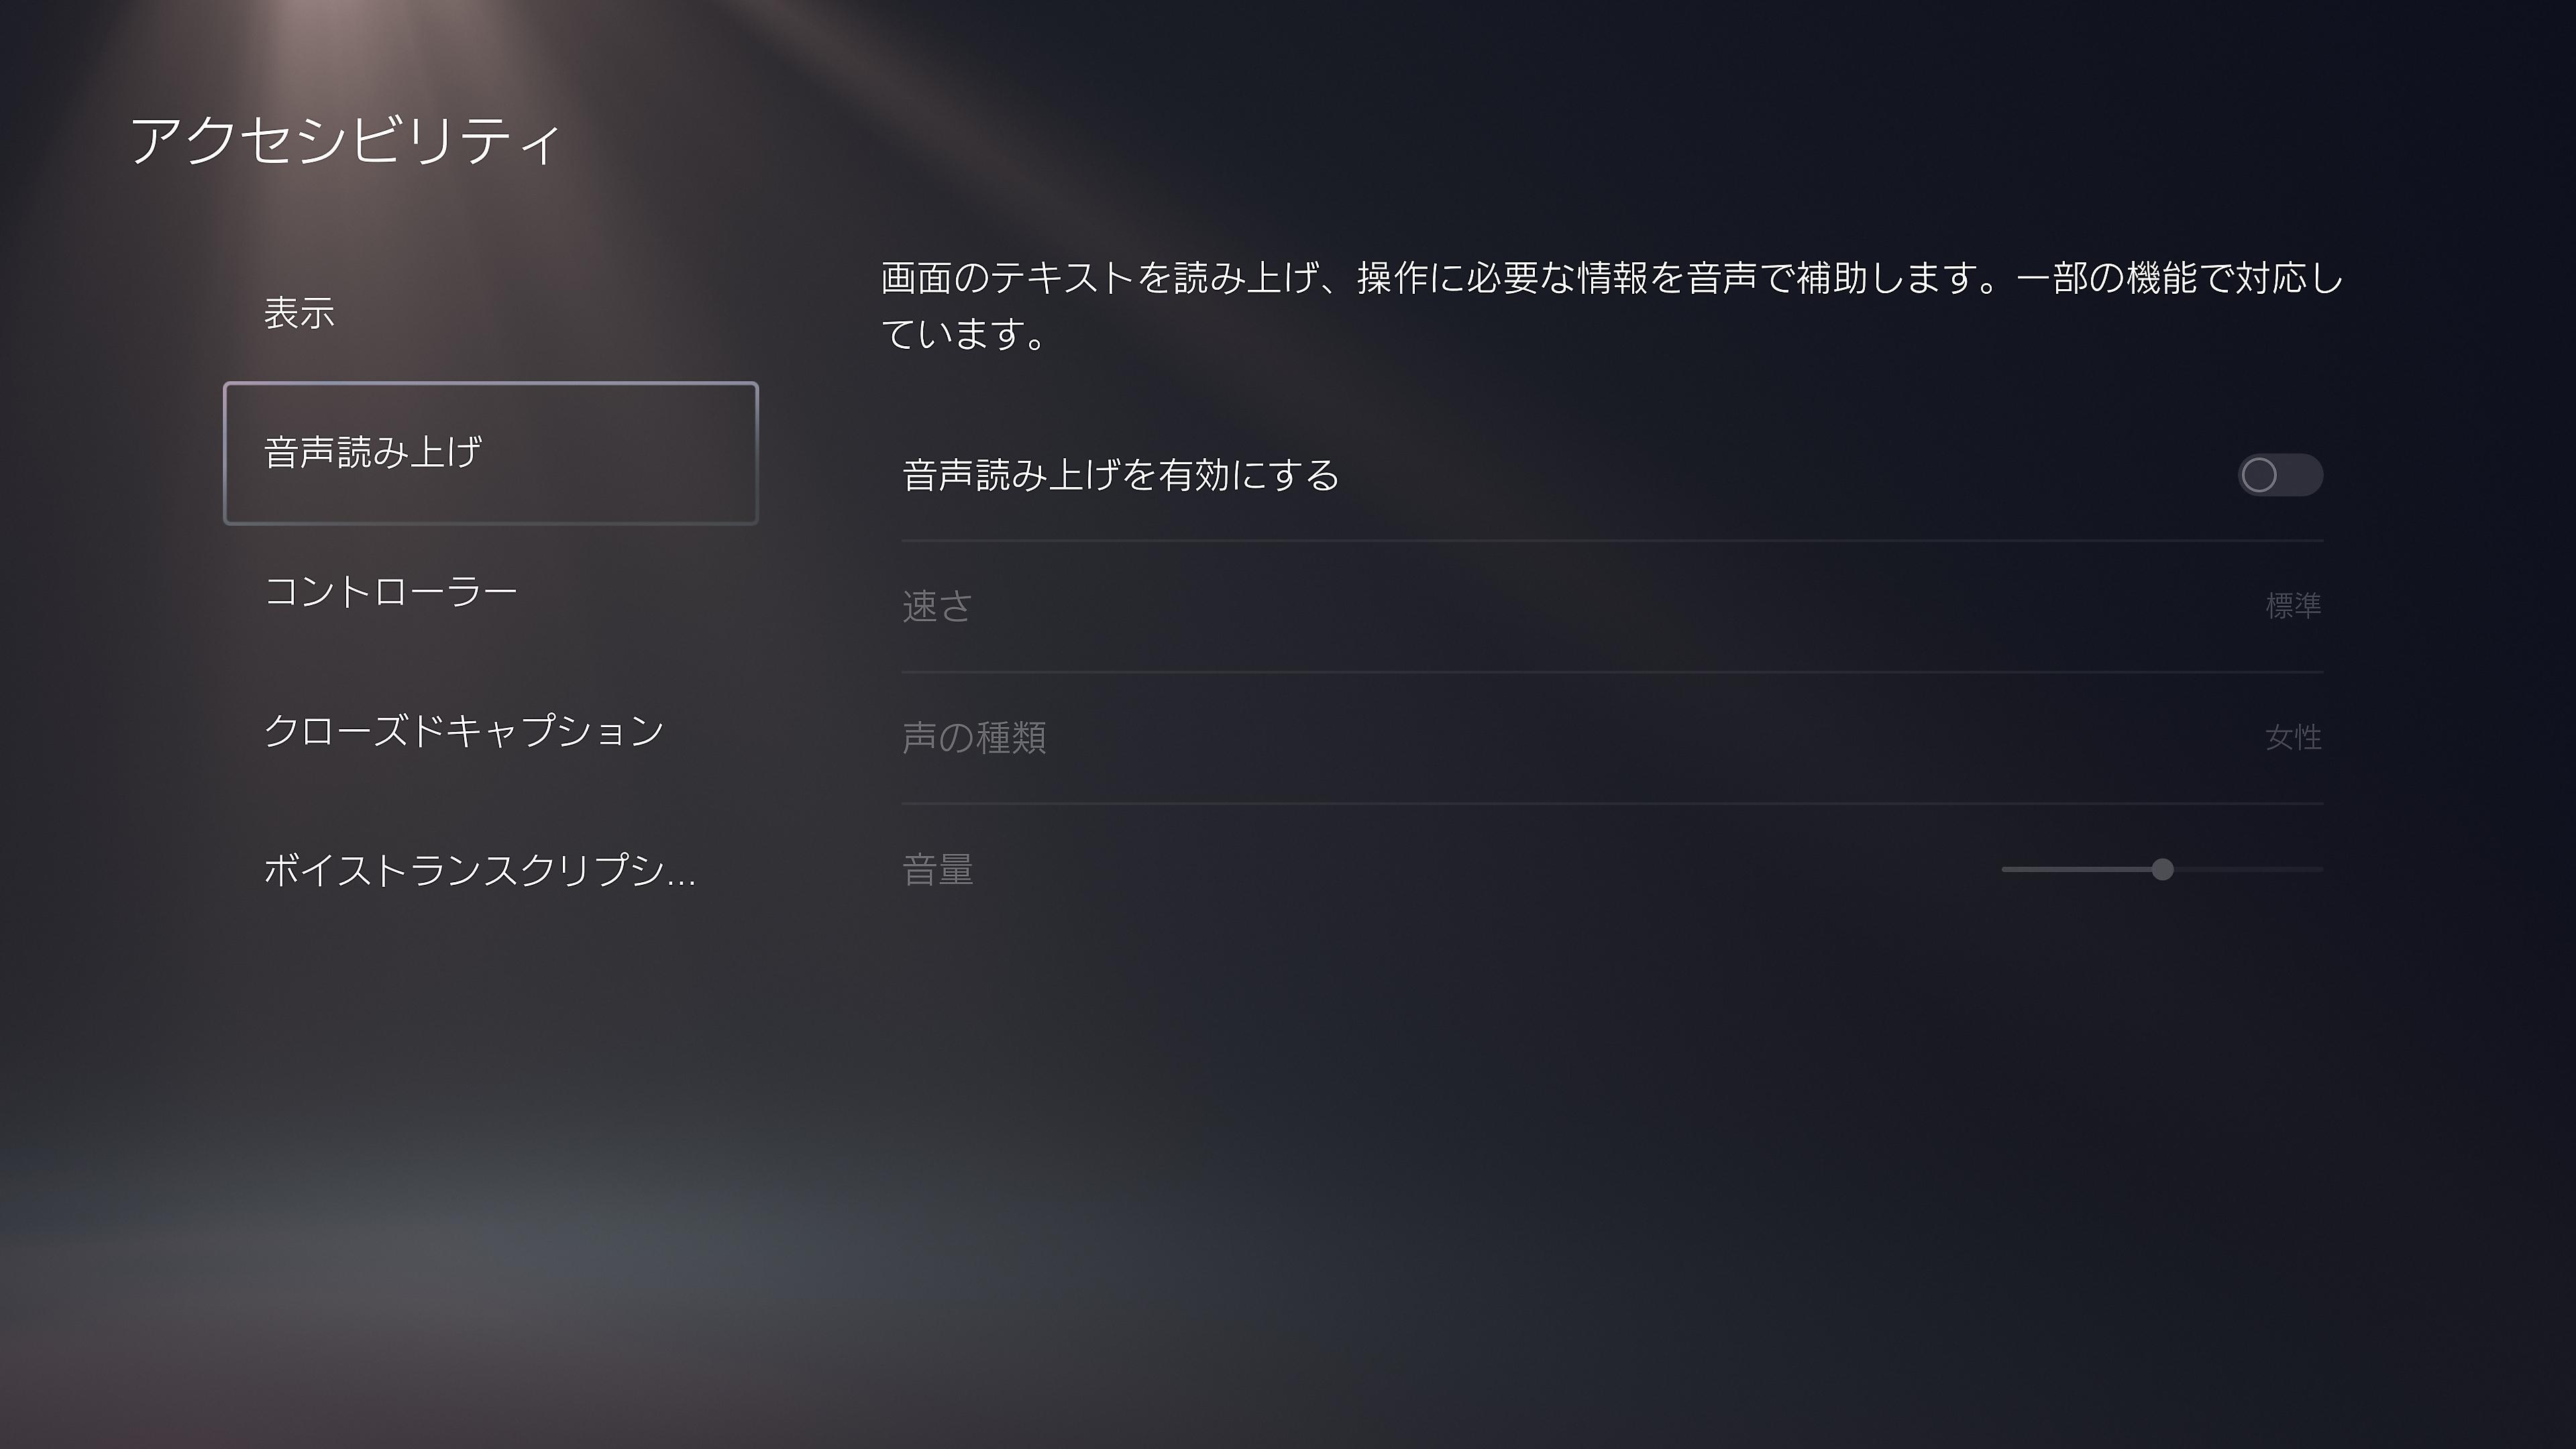 PS5アクセシビリティ - 音声読み上げ